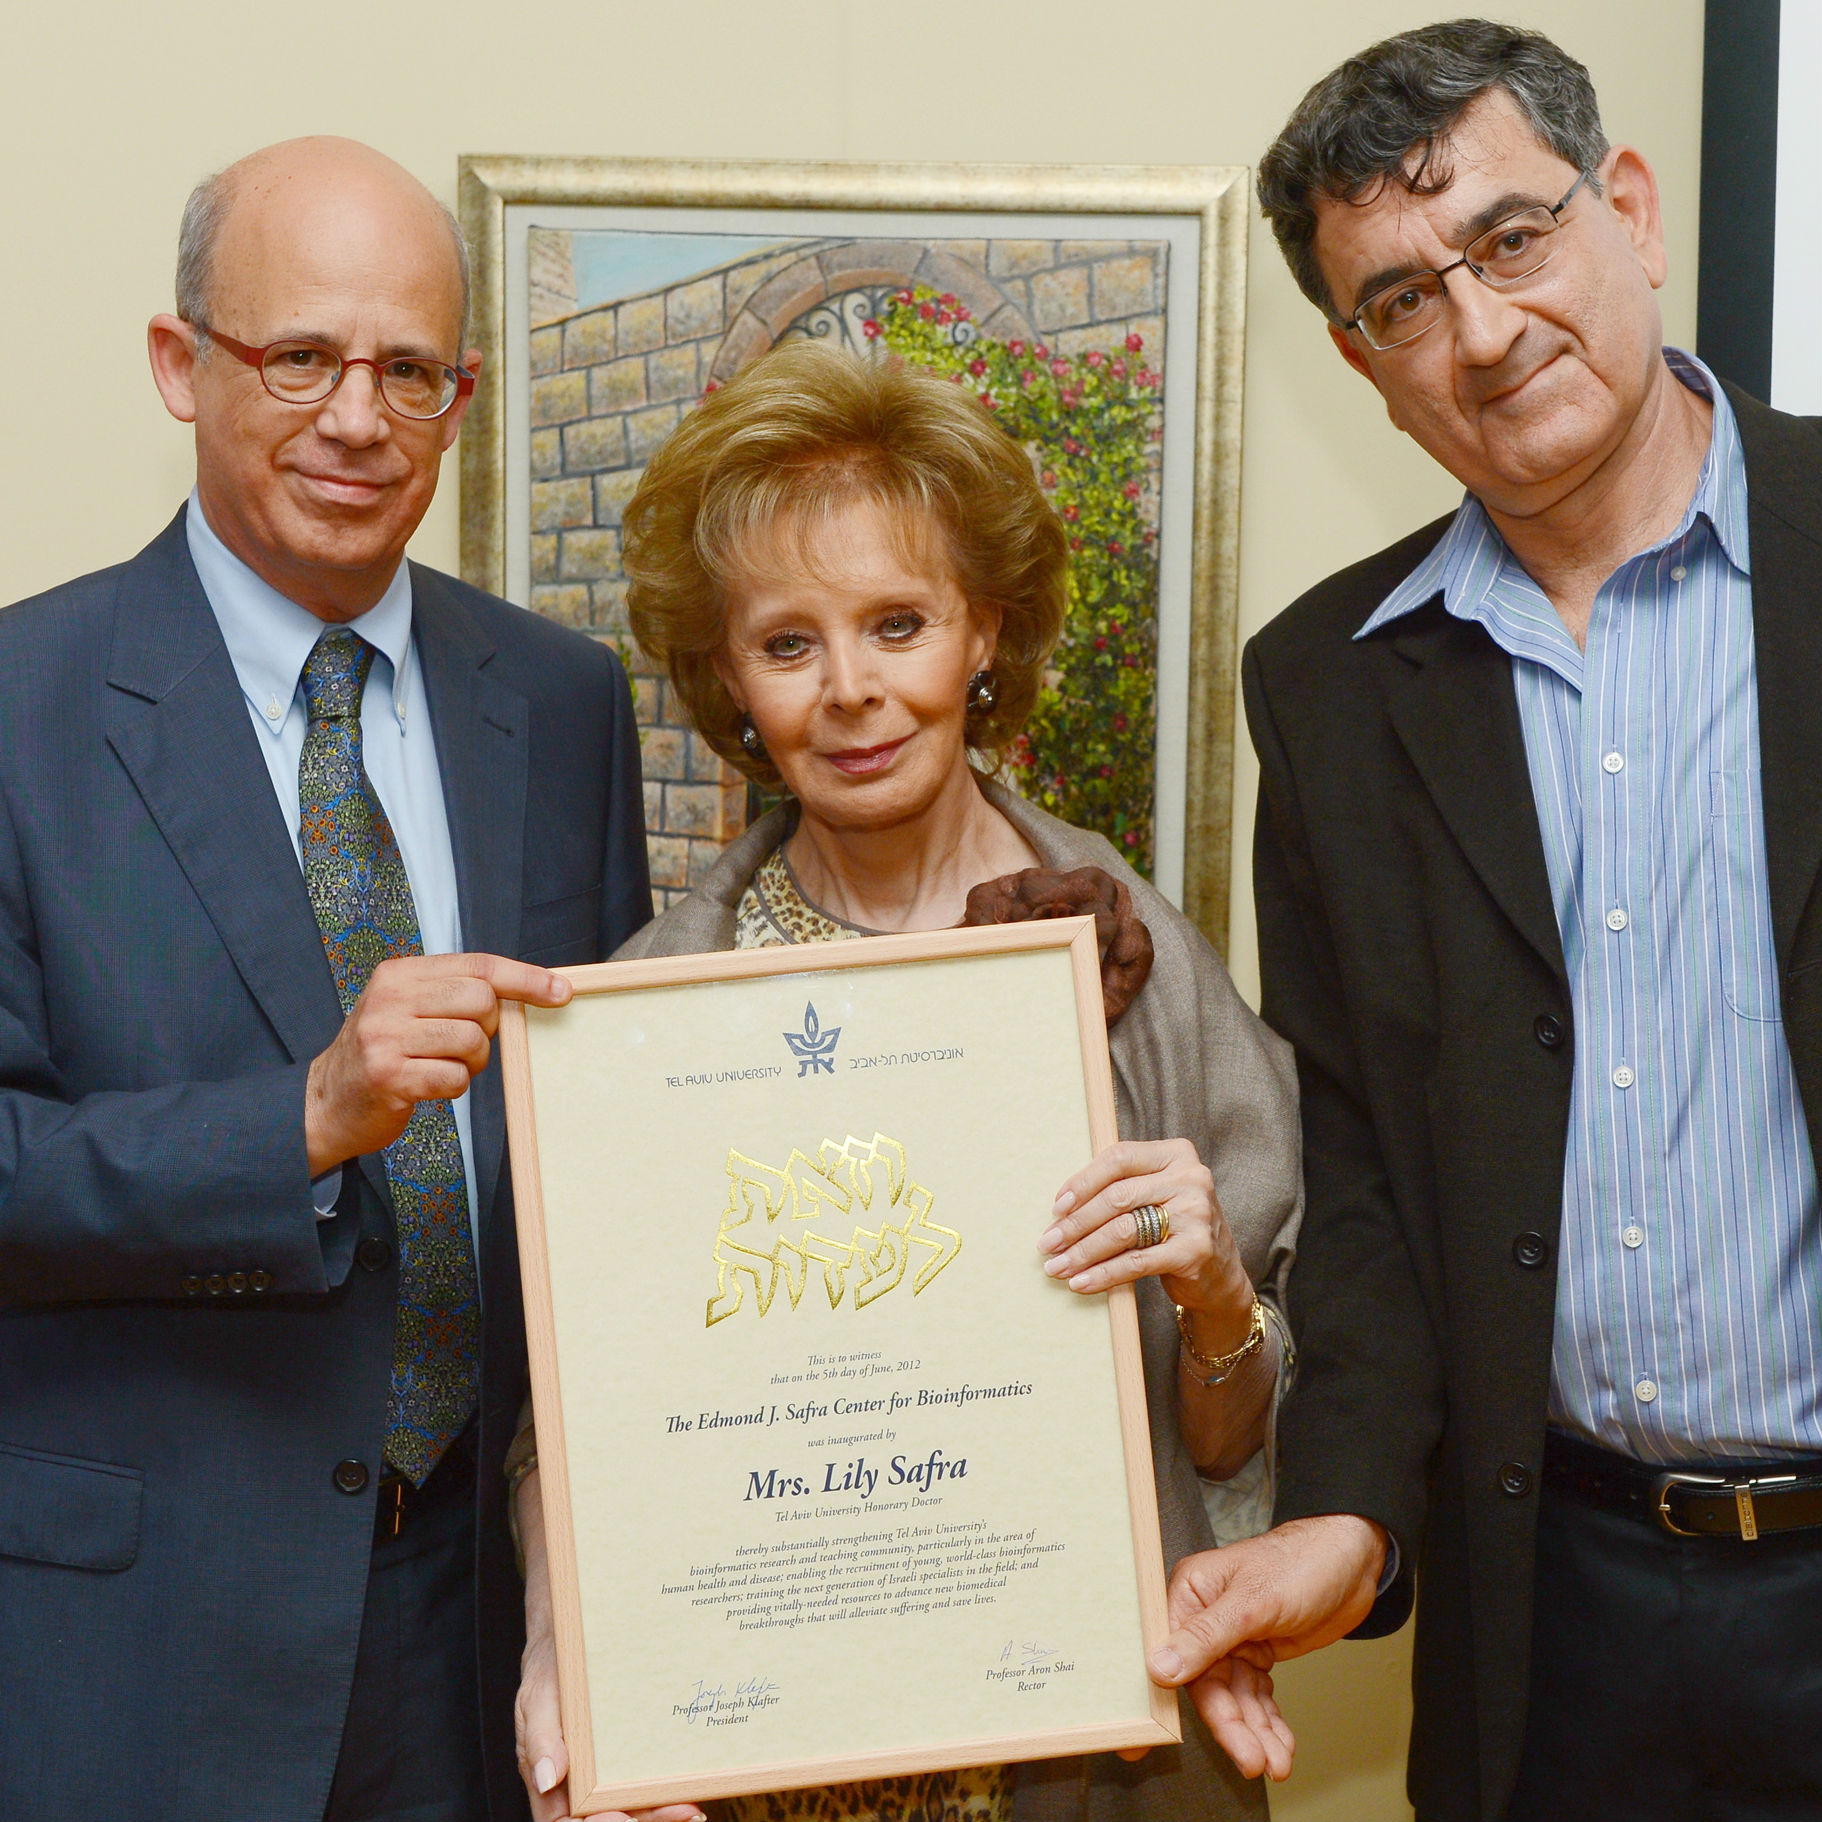 Edmond J. Safra Center for Bioinformatics Inaugurated